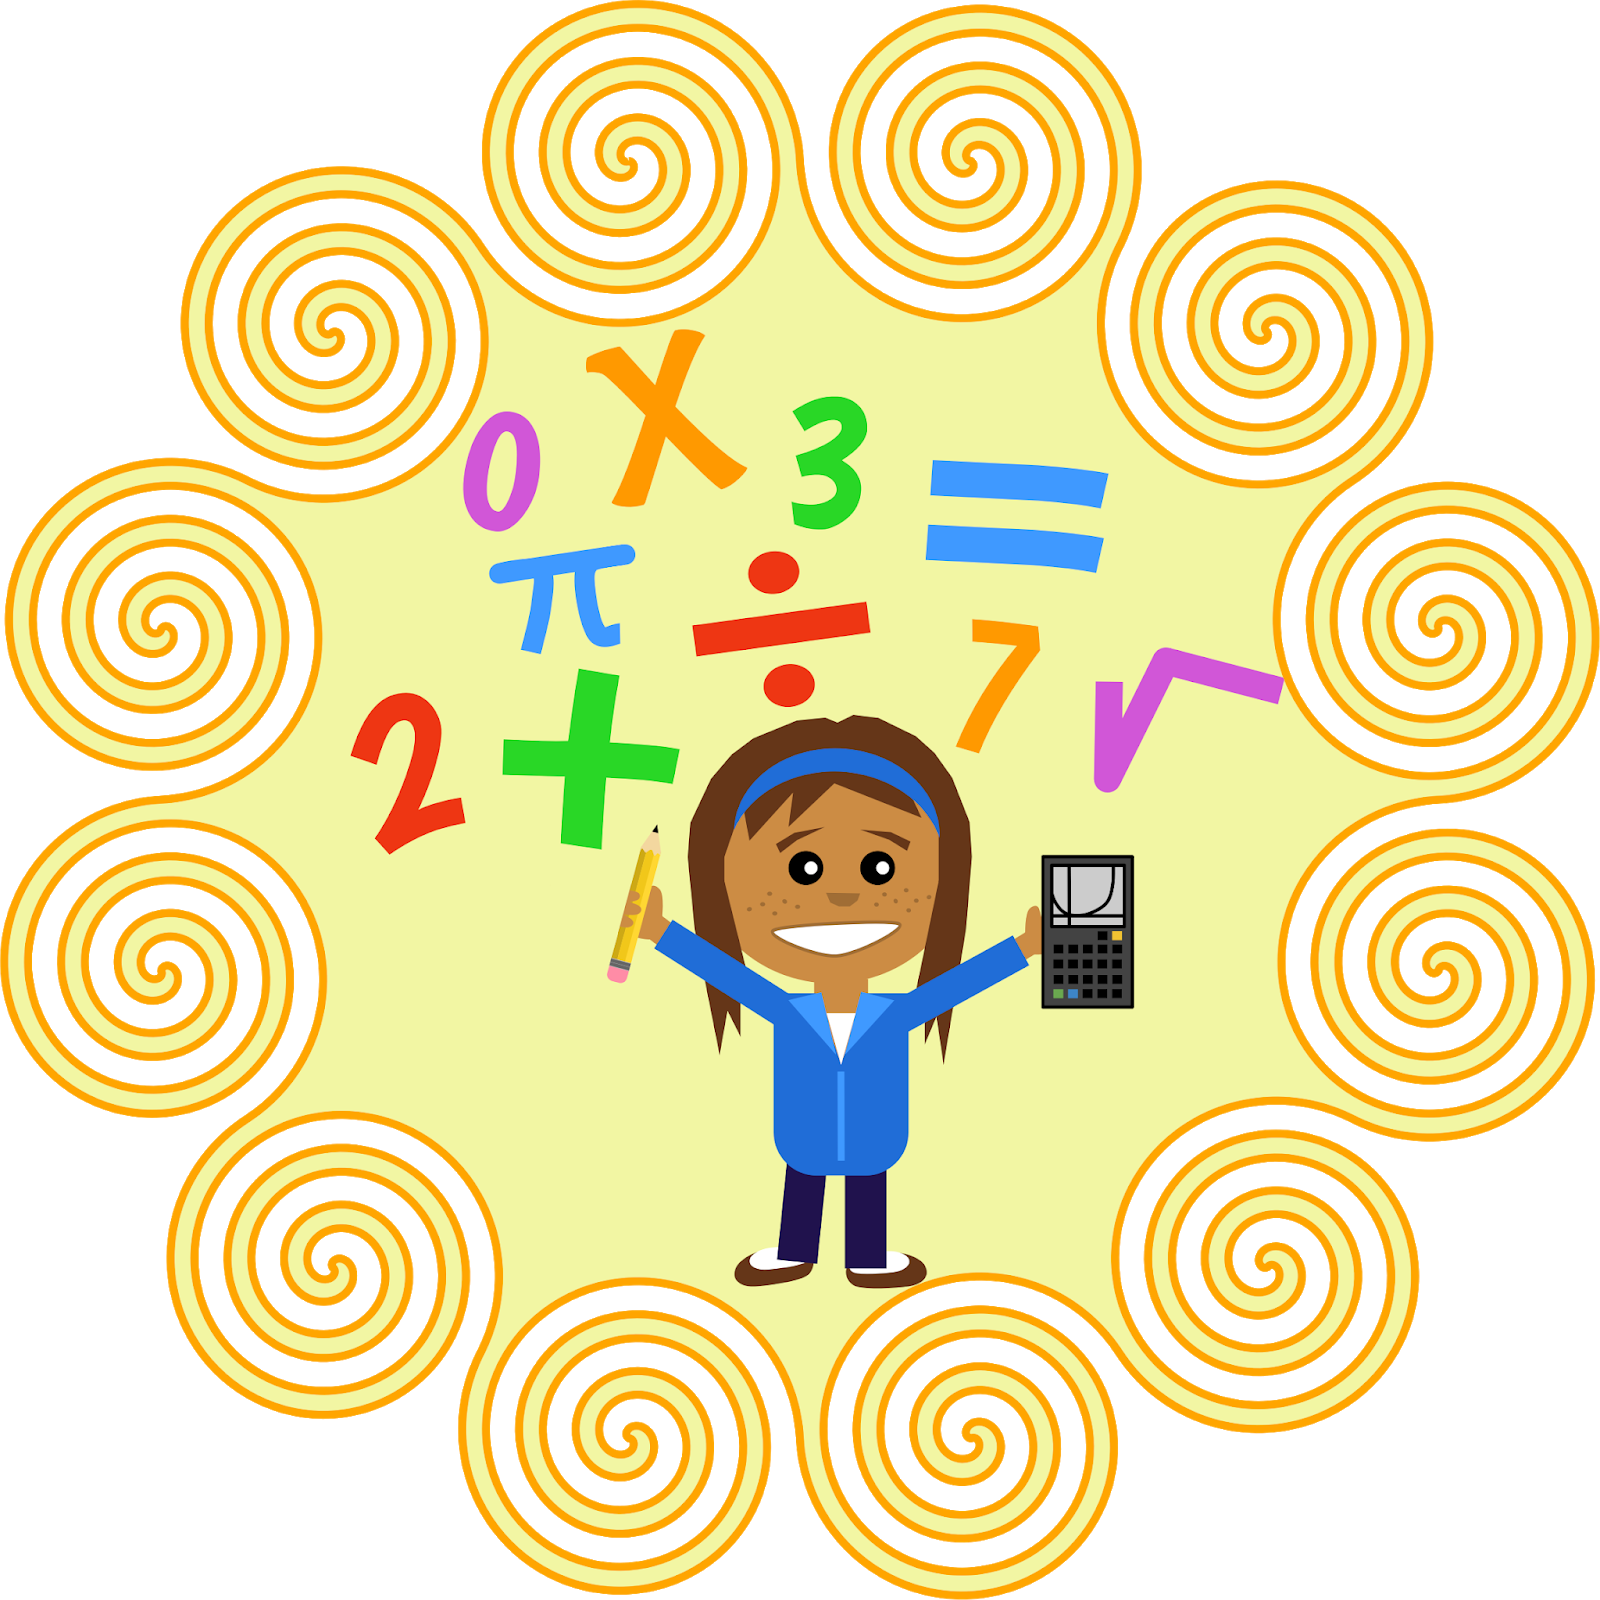 Fun Cool Math For Kids 3 Interesting Ideas For Preschool Math